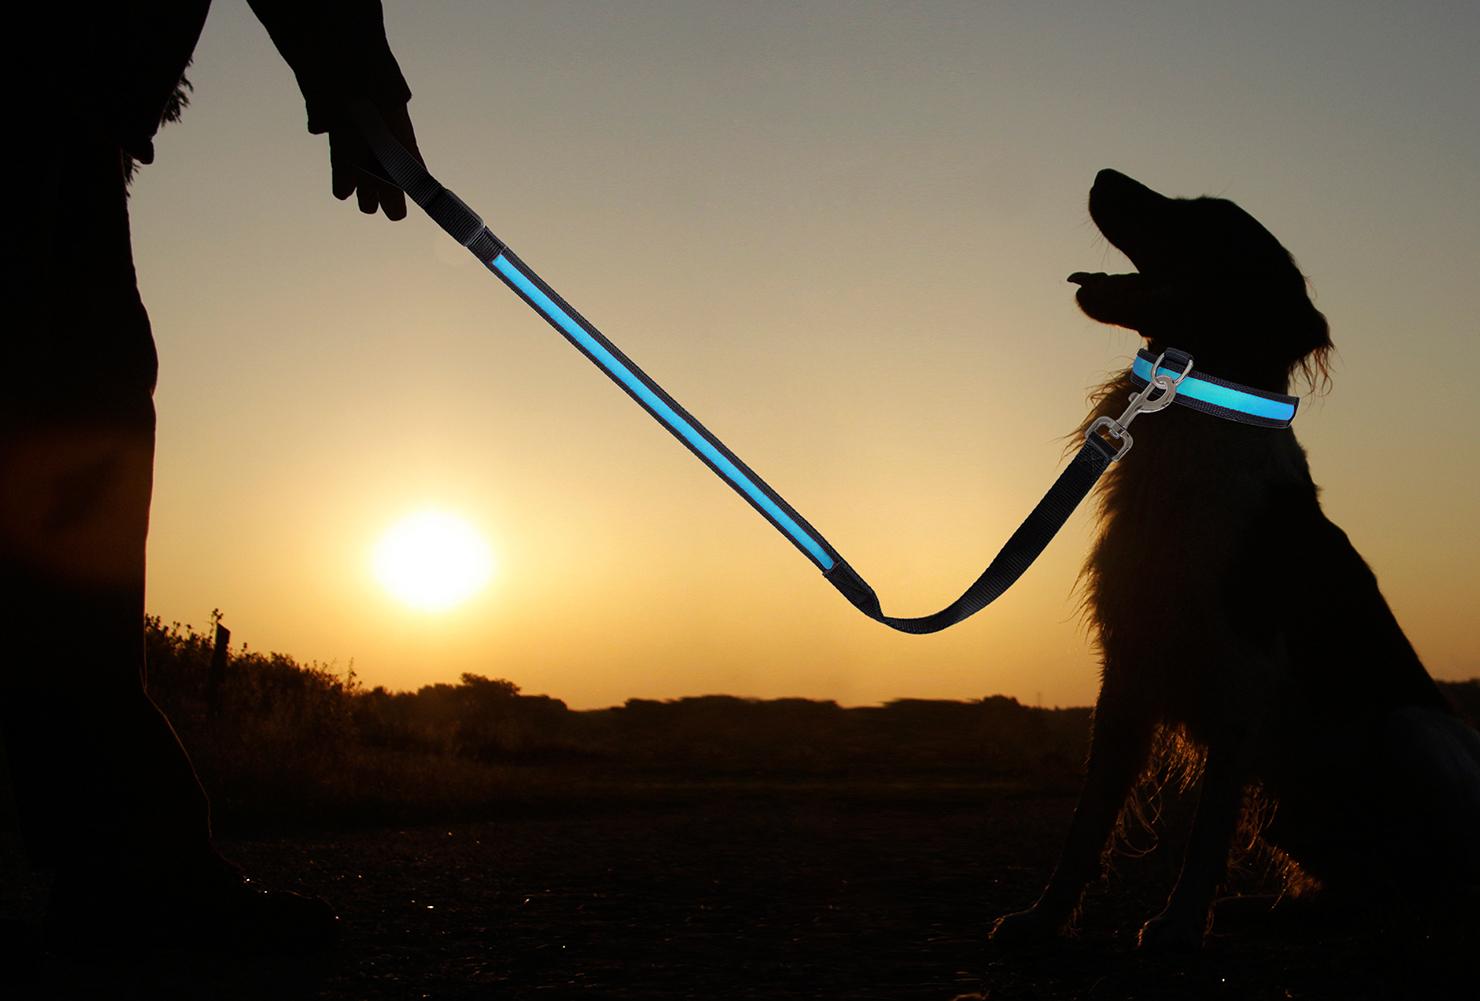 Led Halsband Led Hundehalsband Hundegeschirr Hunde Leine